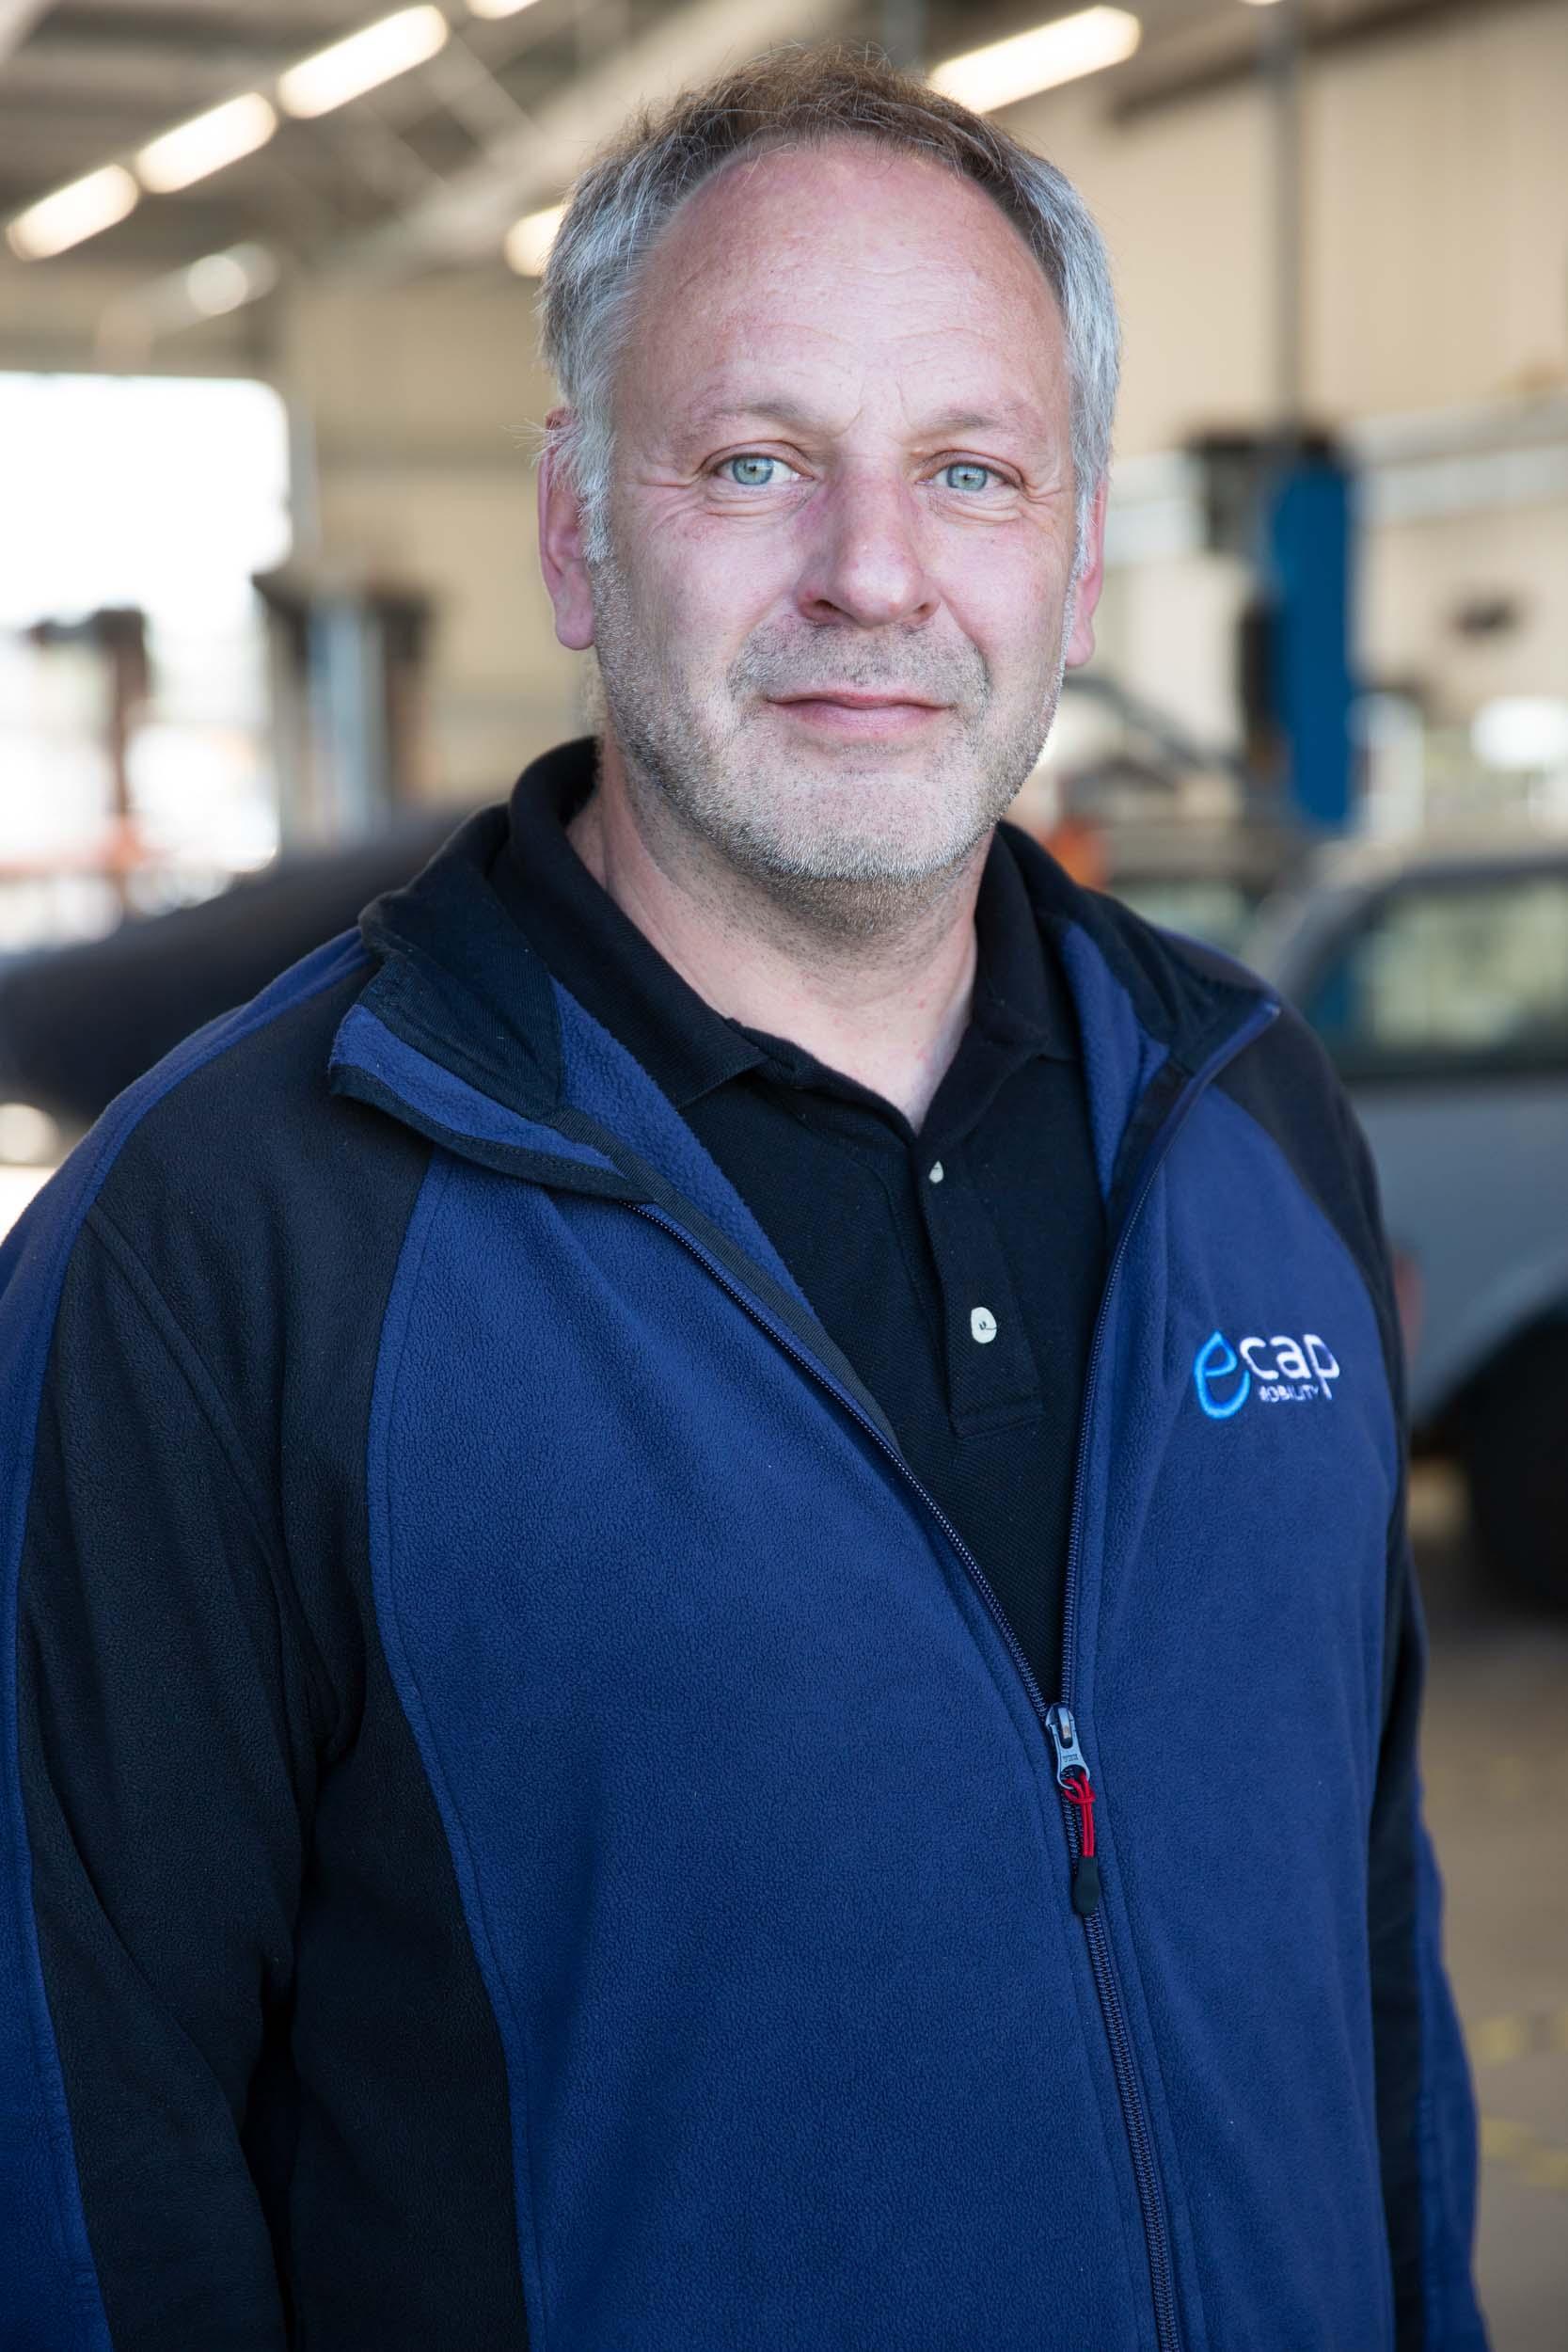 Oliver Schäfer | Warehouse & Purchasing osc@ecap-mobility.com